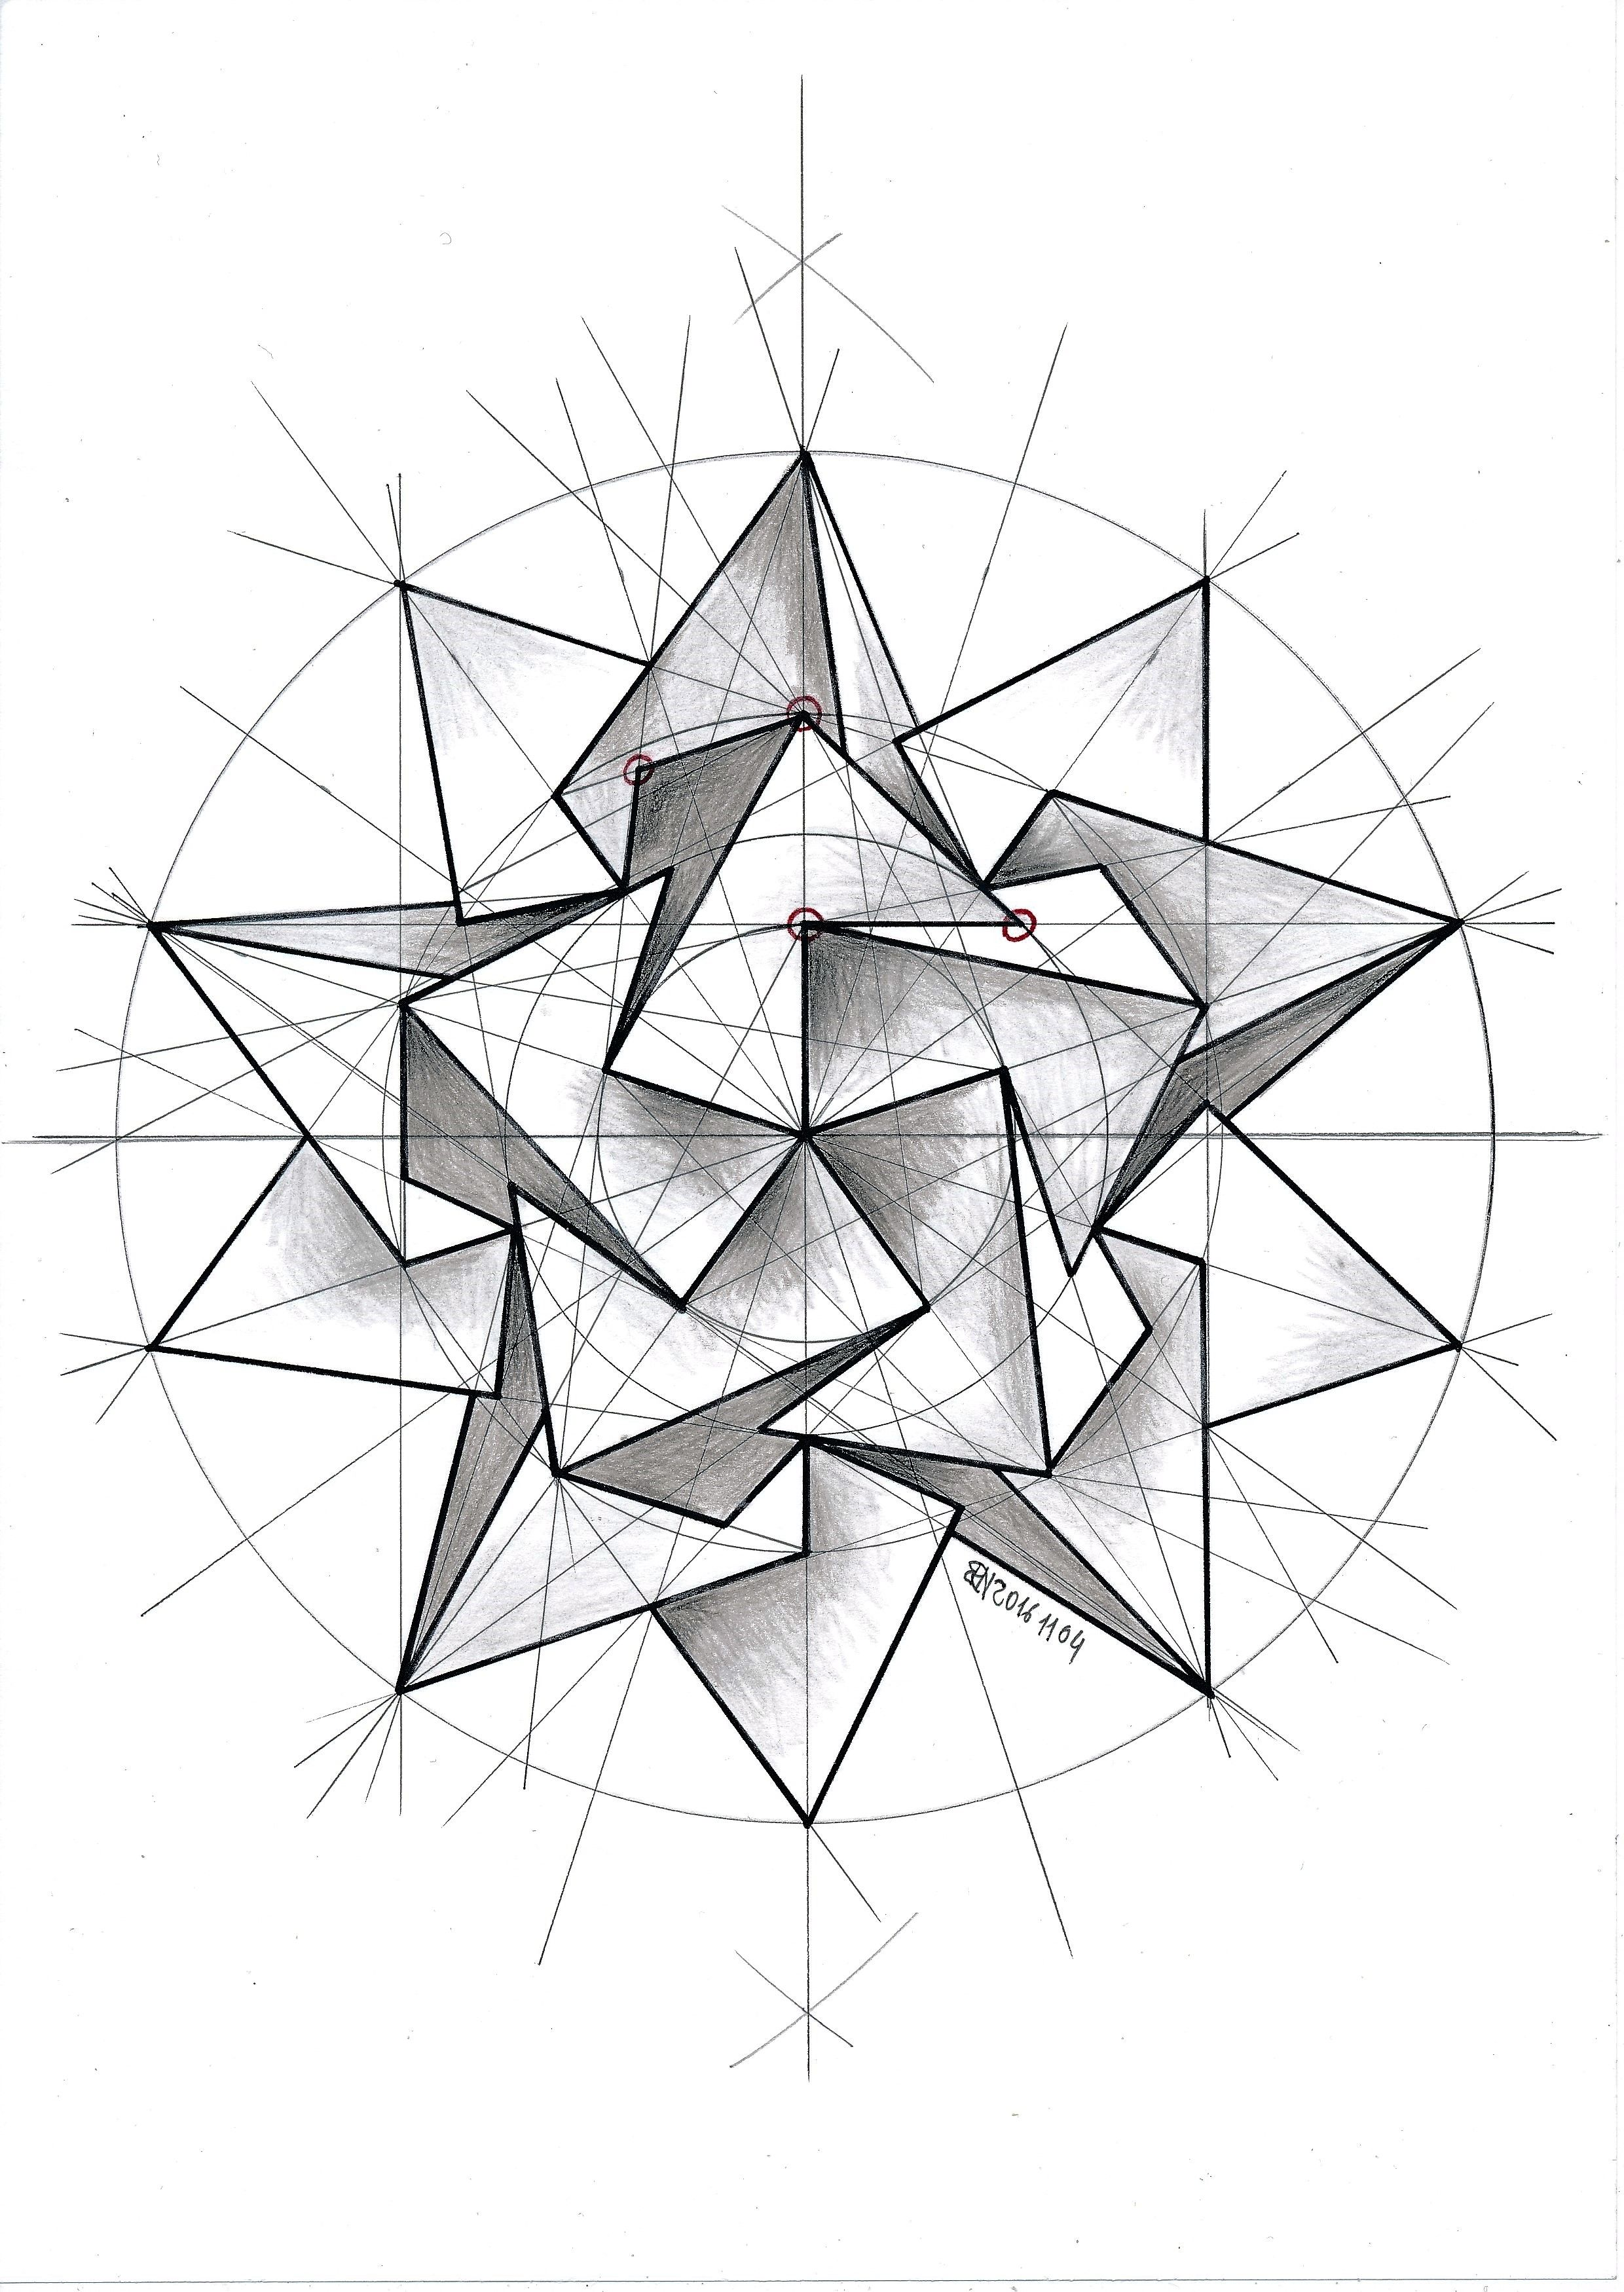 Polyhedra Solid Geometry Symmetry Pattern Handmade